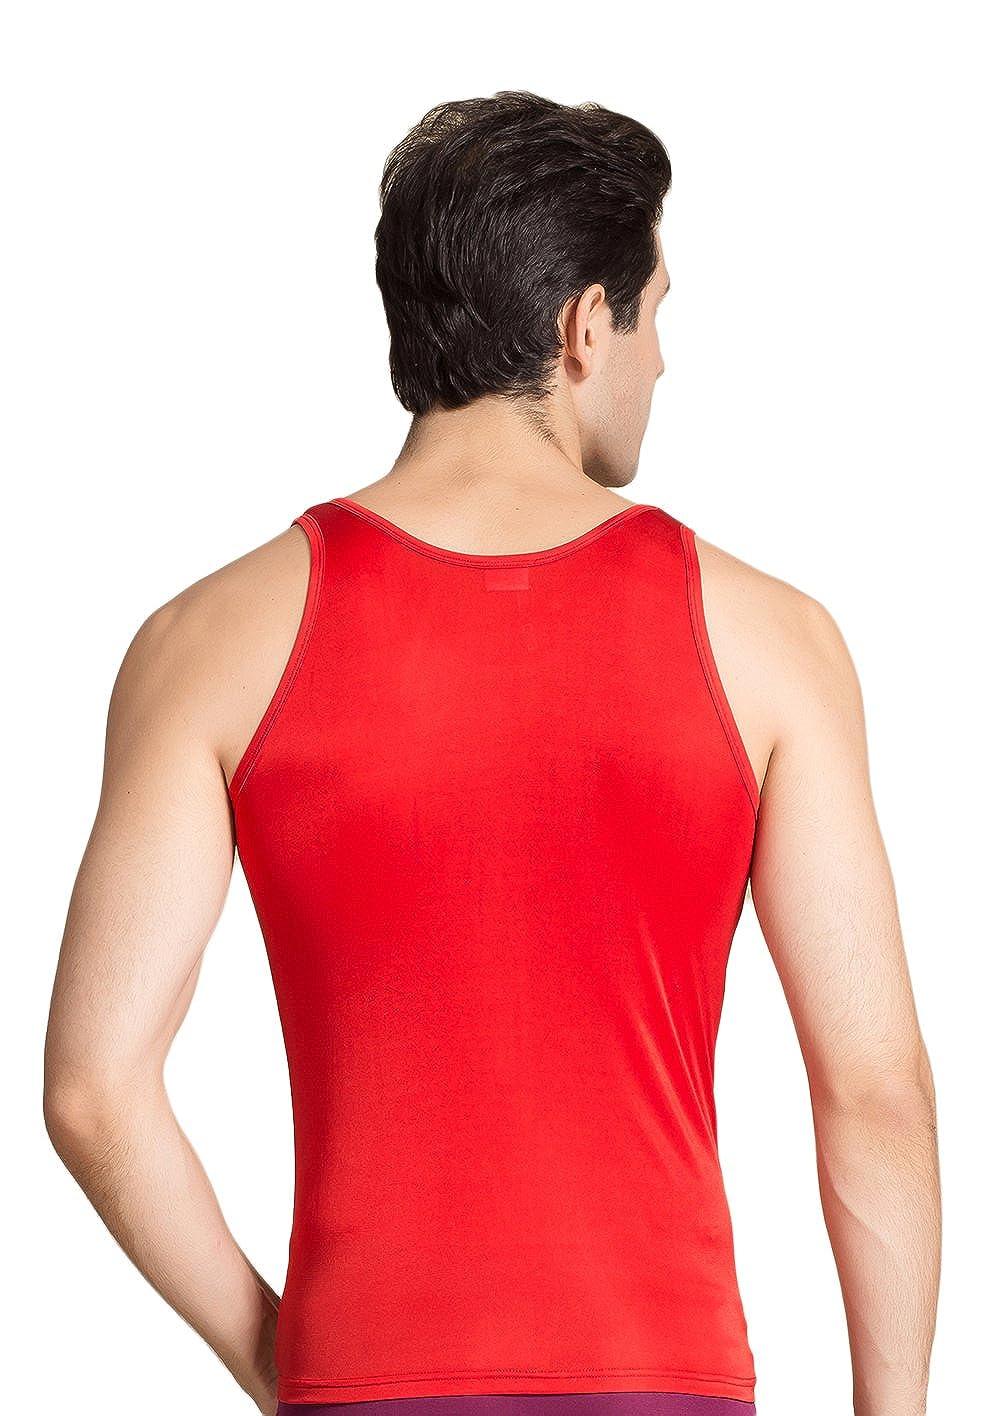 499e7613d6e9ba CLC Men s Mulberry Silk Camisole Sleeveless Shirt Tank Tops Knit Fabric at  Amazon Men s Clothing store